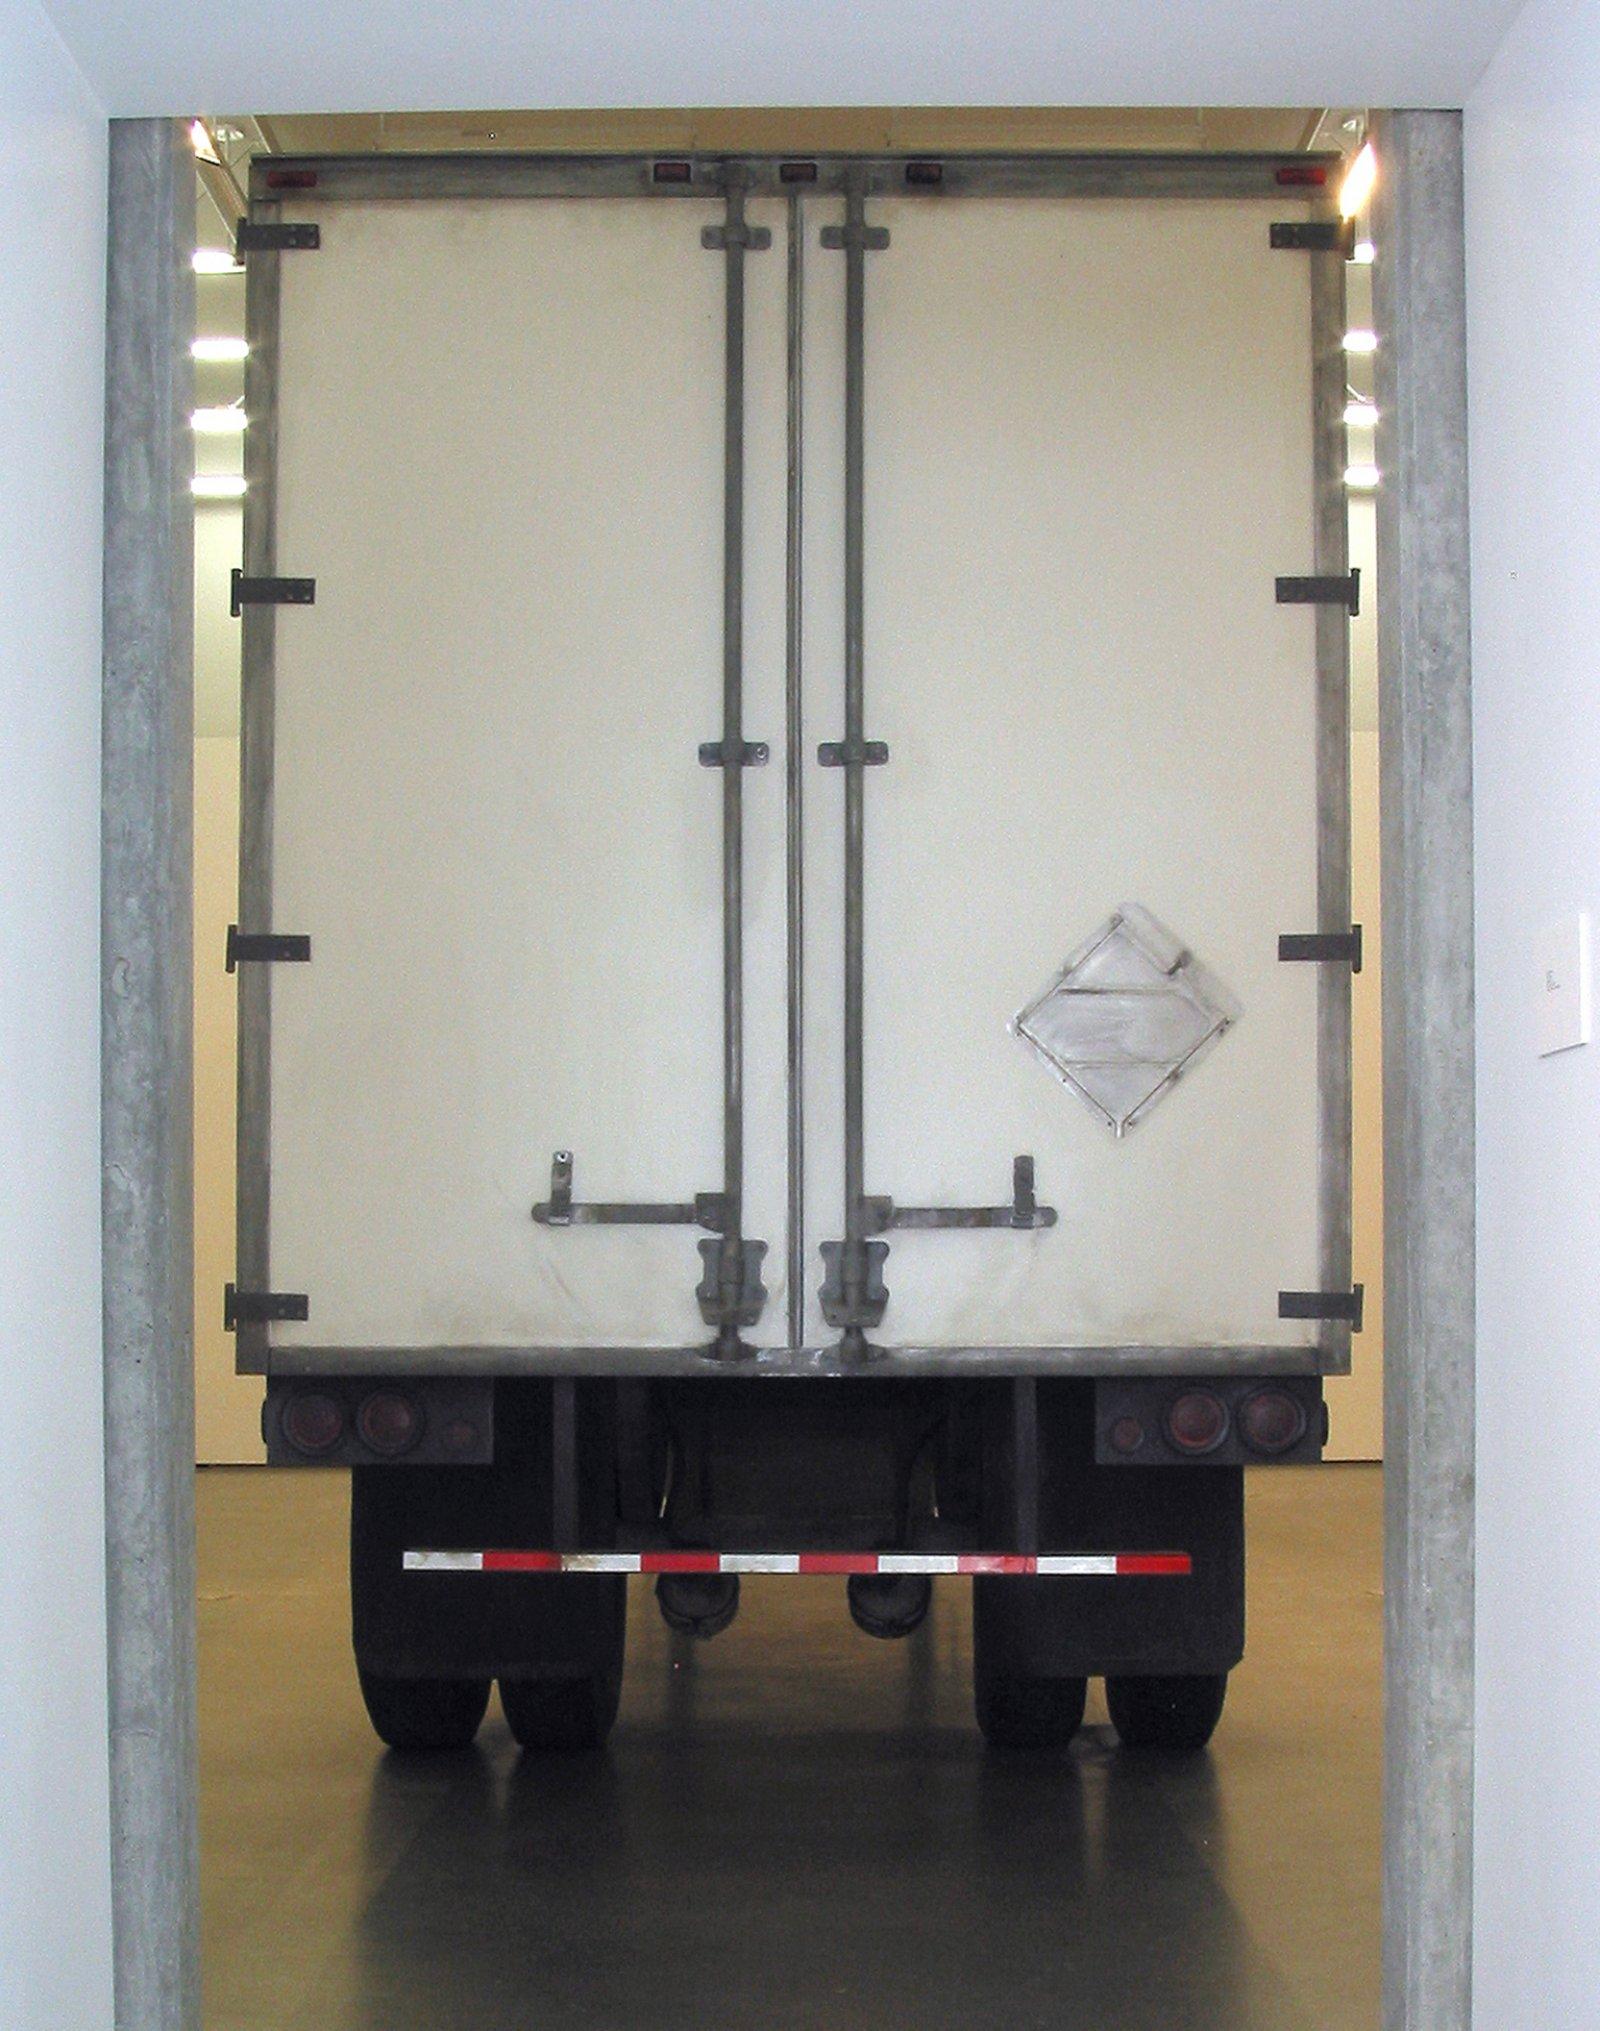 Geoffrey Farmer,Trailer, 2002, steel, fiberboard, mixed media, 134 x 87 x 354 in. (340 x 220 x 900 cm)